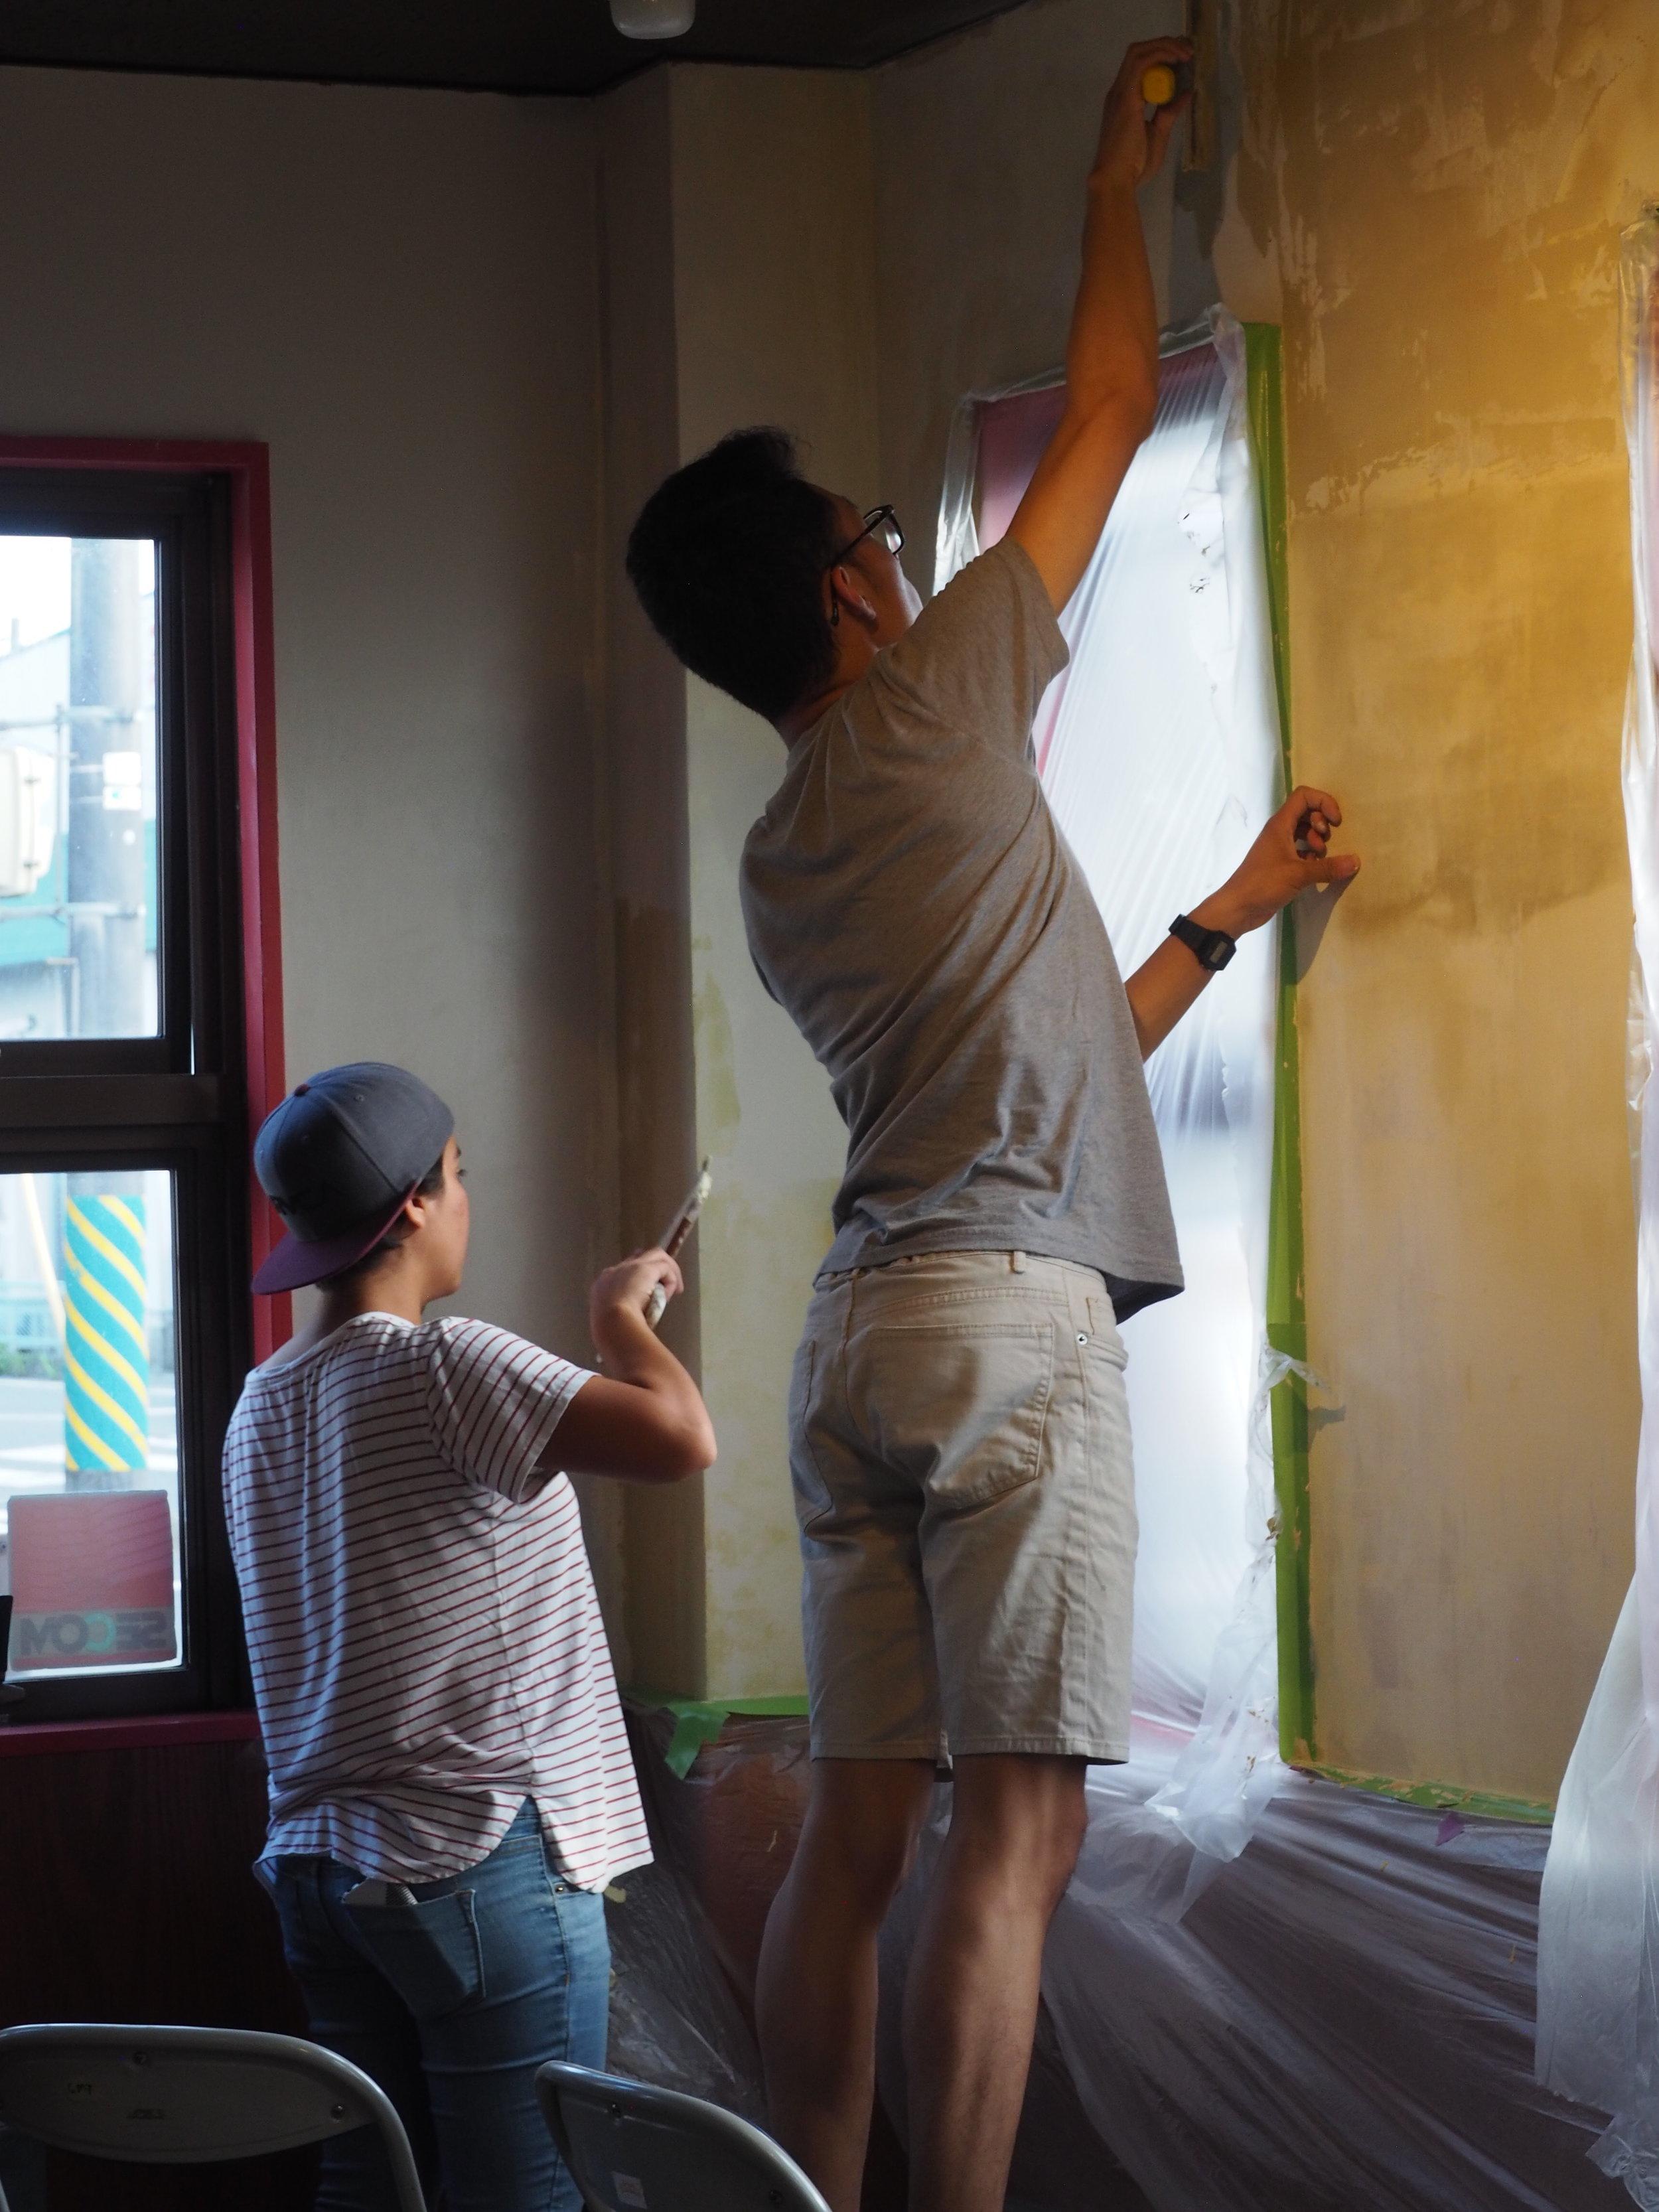 Hannah & Nick preparing walls for painting